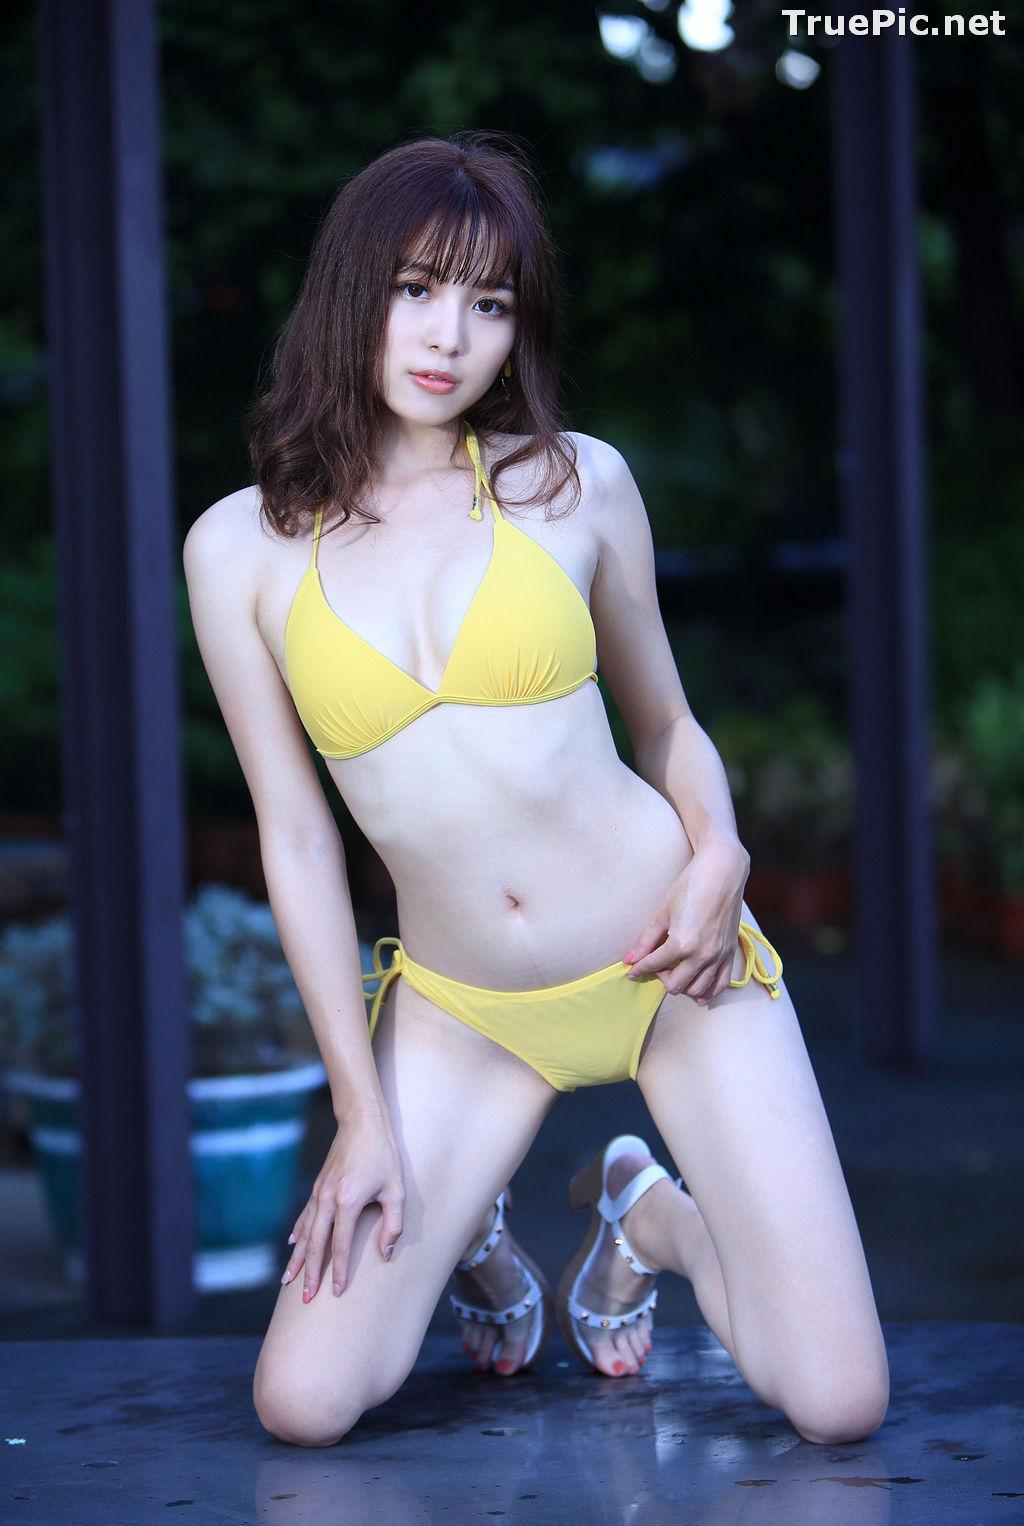 Image Taiwanese Model - Ash Ley - Yellow Bikini at Taipei Water Museum - TruePic.net - Picture-15